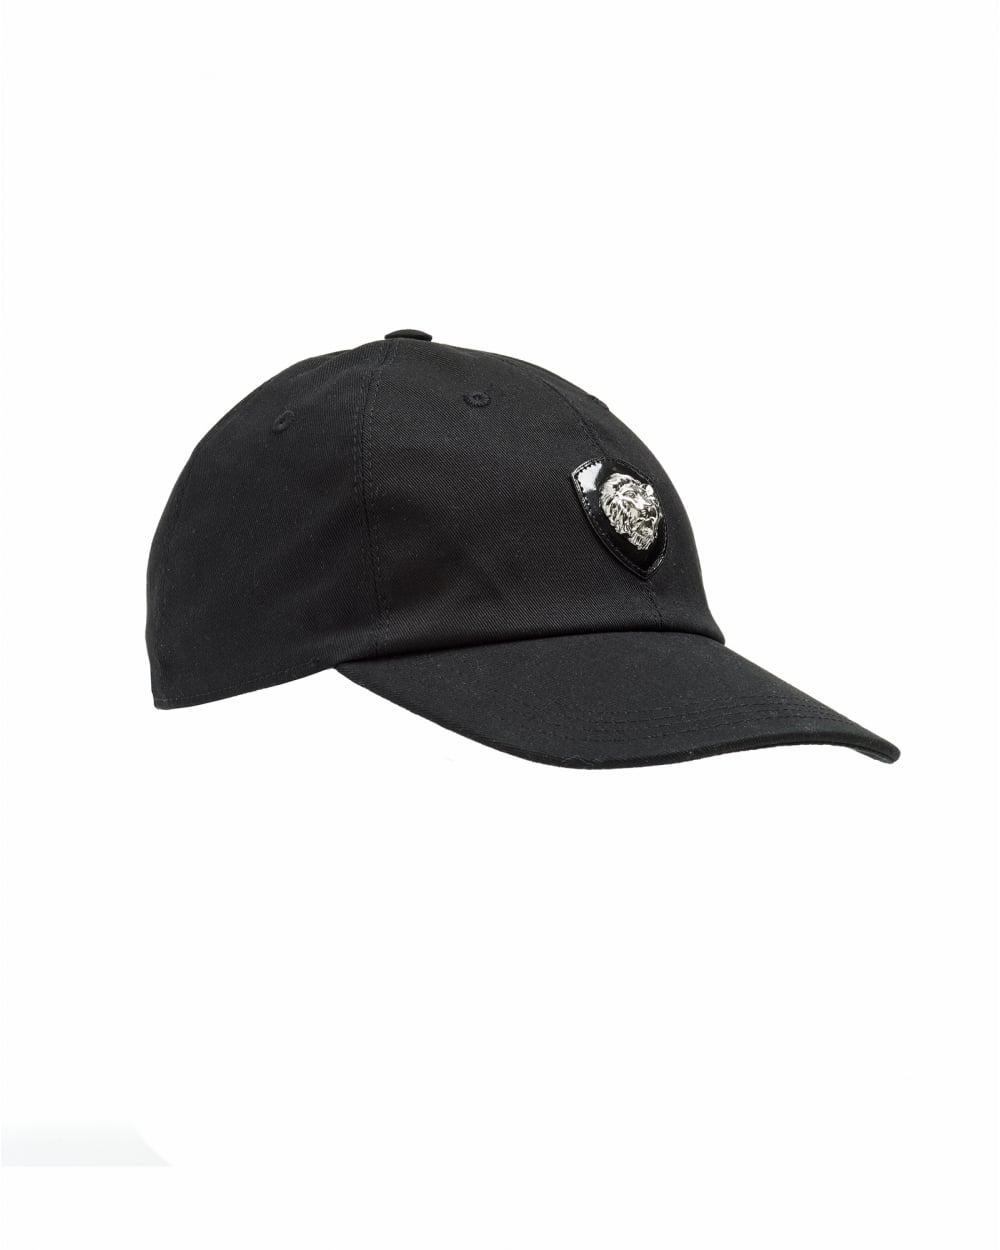 Versus Versace Mens Hat 1e4292049a2